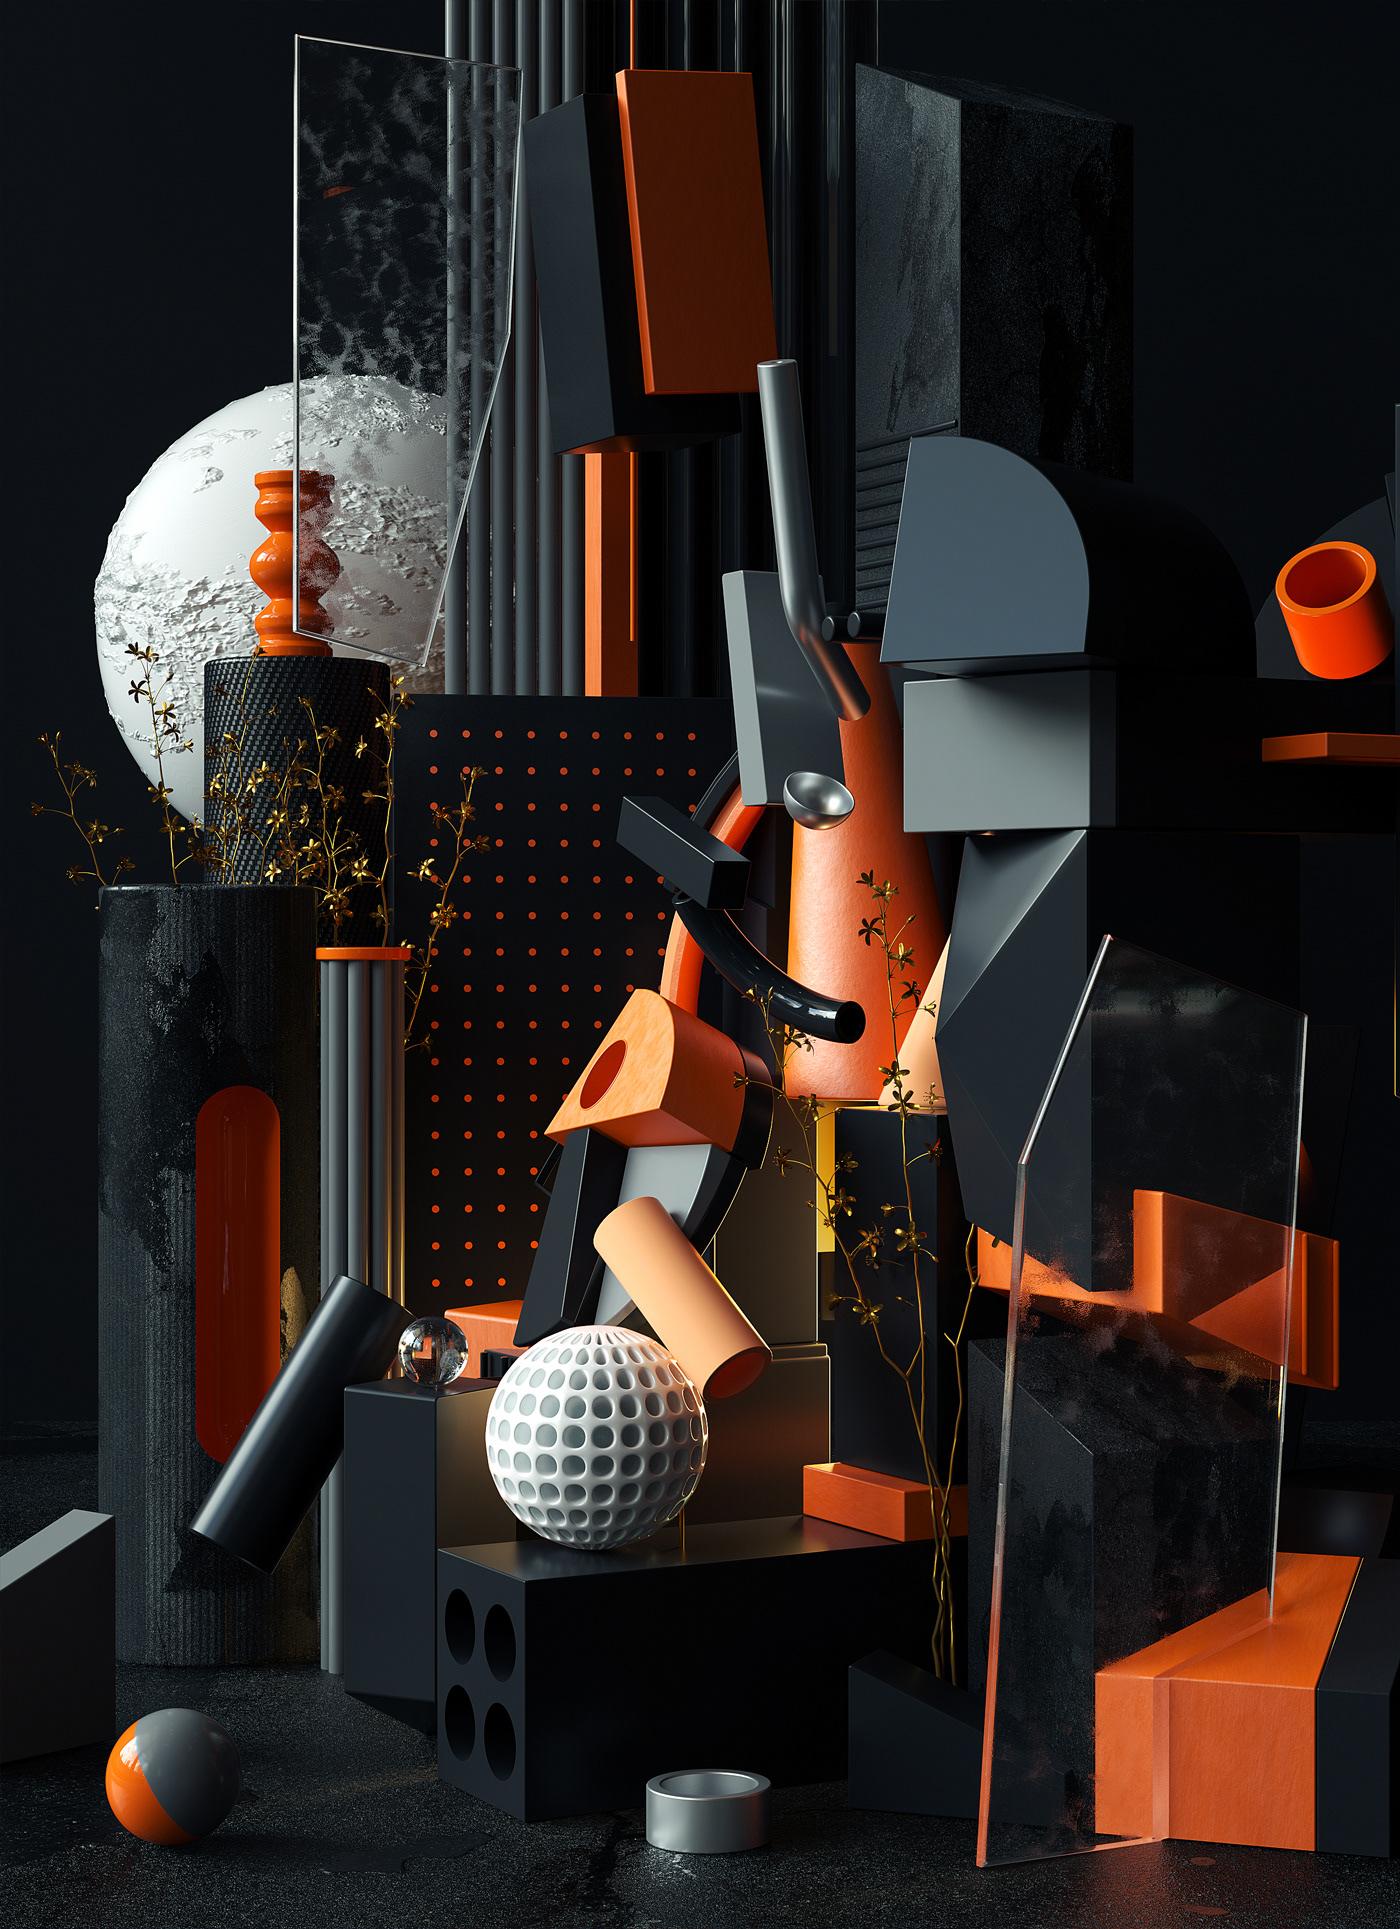 3D art design still life compositions set design  modern cubism cinema4d Picasso